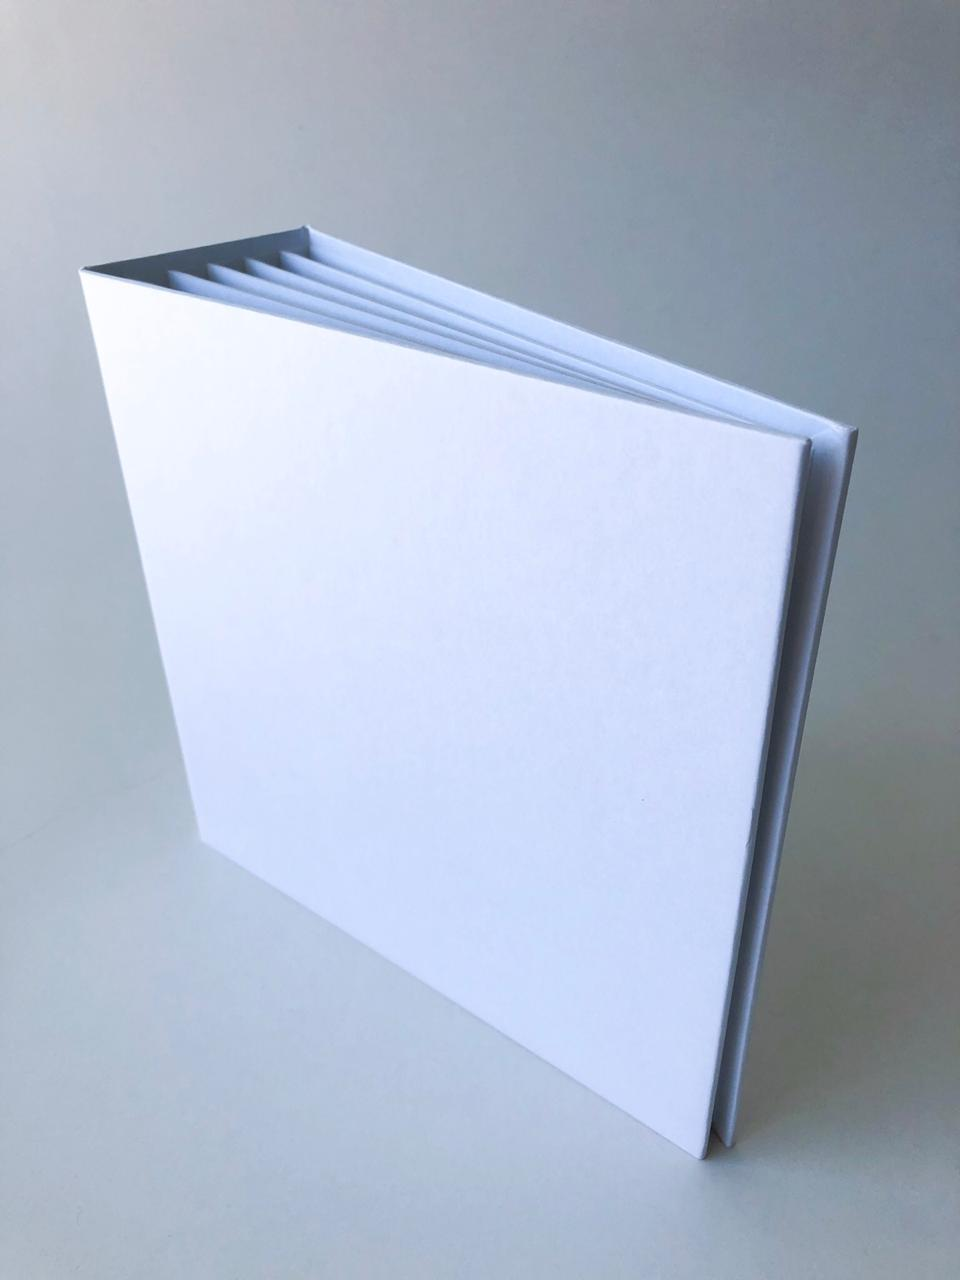 Álbum 20 x 20 com lombada Branco - JuJu Scrapbook  - JuJu Scrapbook